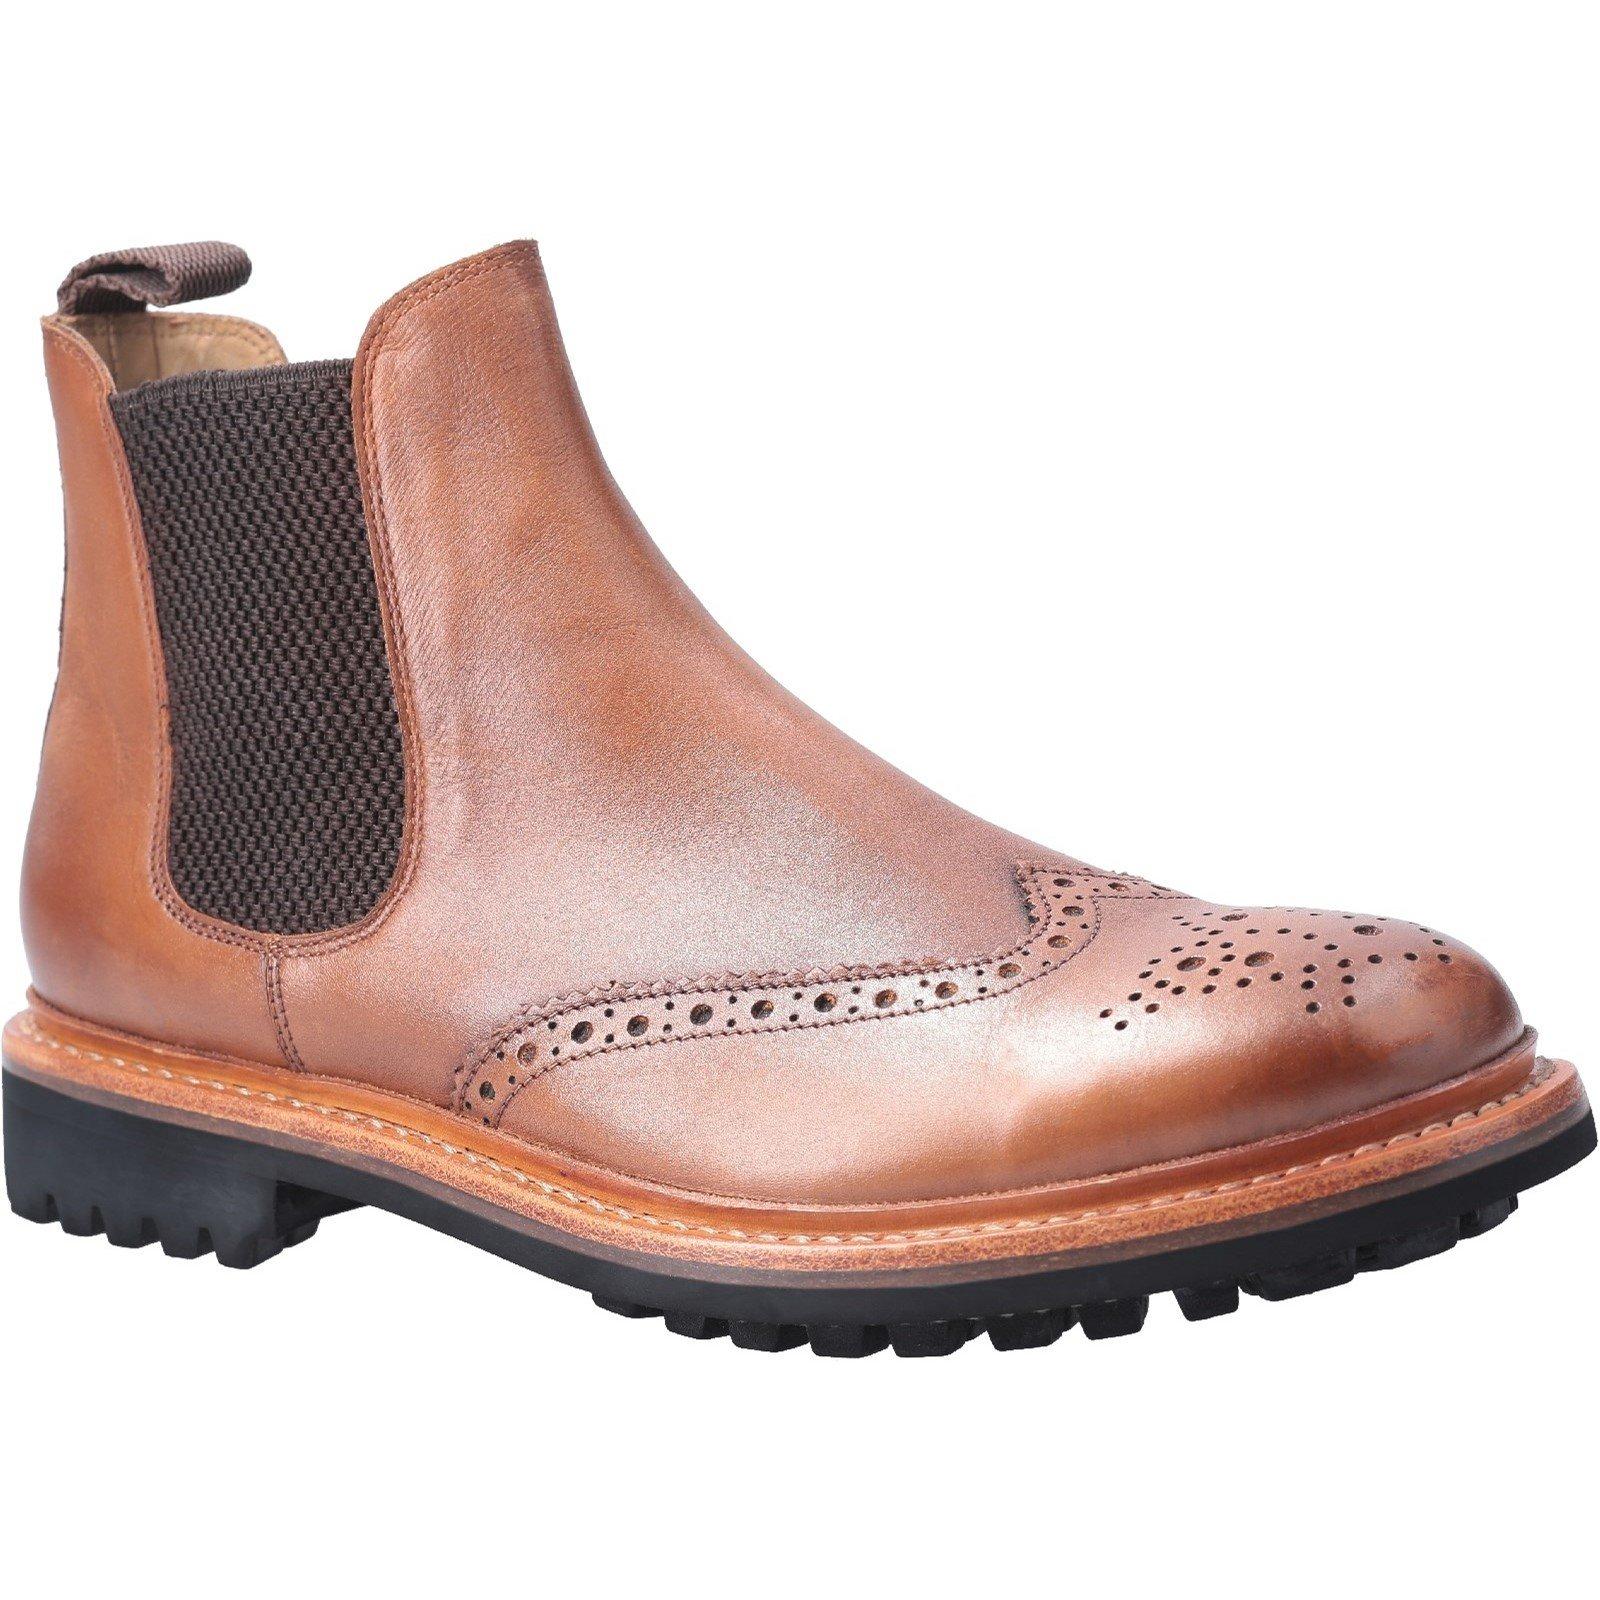 Cotswold Men's Siddington Commando Goodyear Welt Boot Brown 29259 - Brown 8